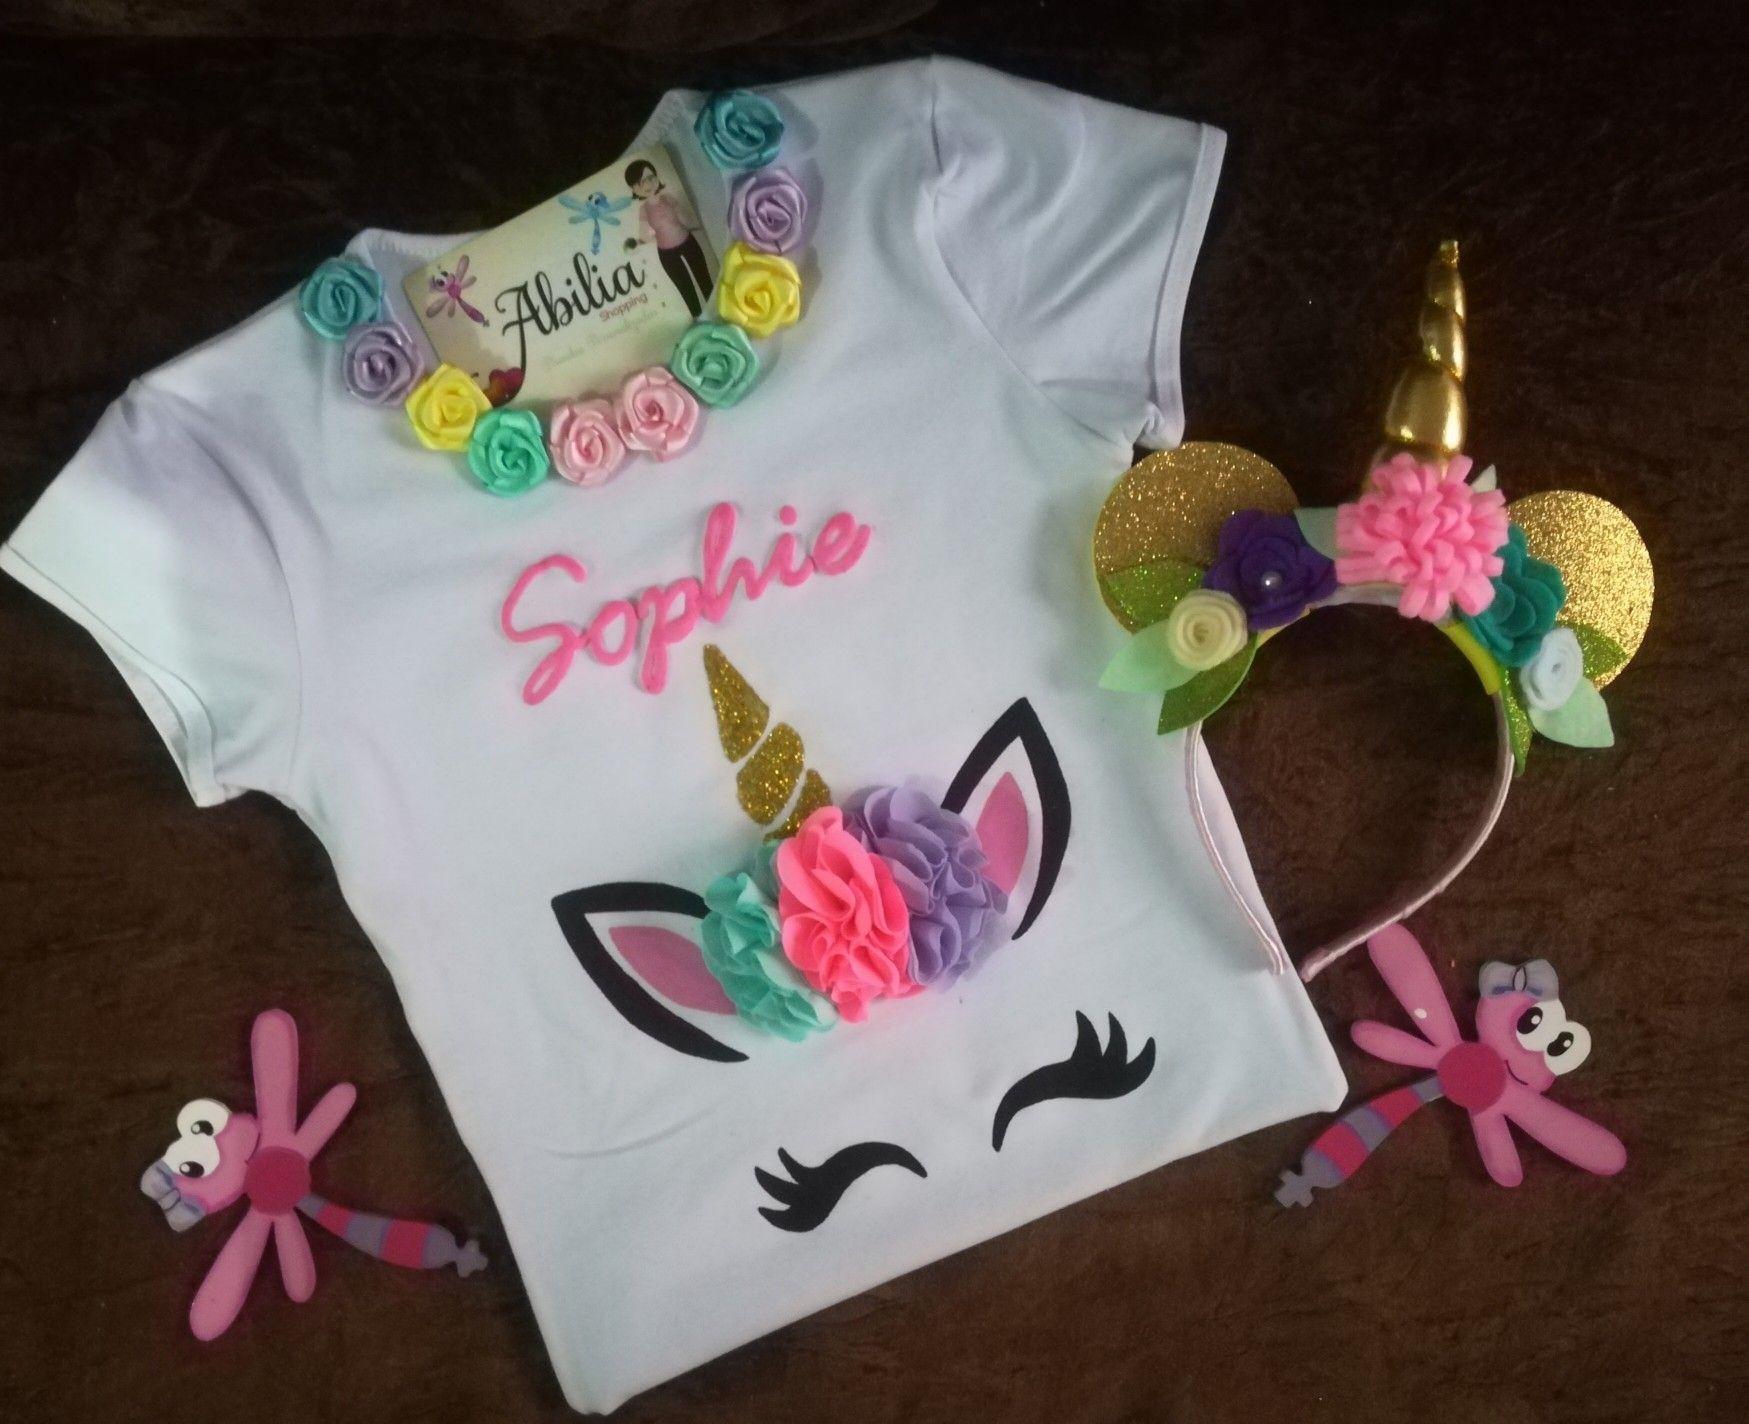 bac161523387a Blusas personalizadas unicornio Abilia shopping Blusas Unicornio